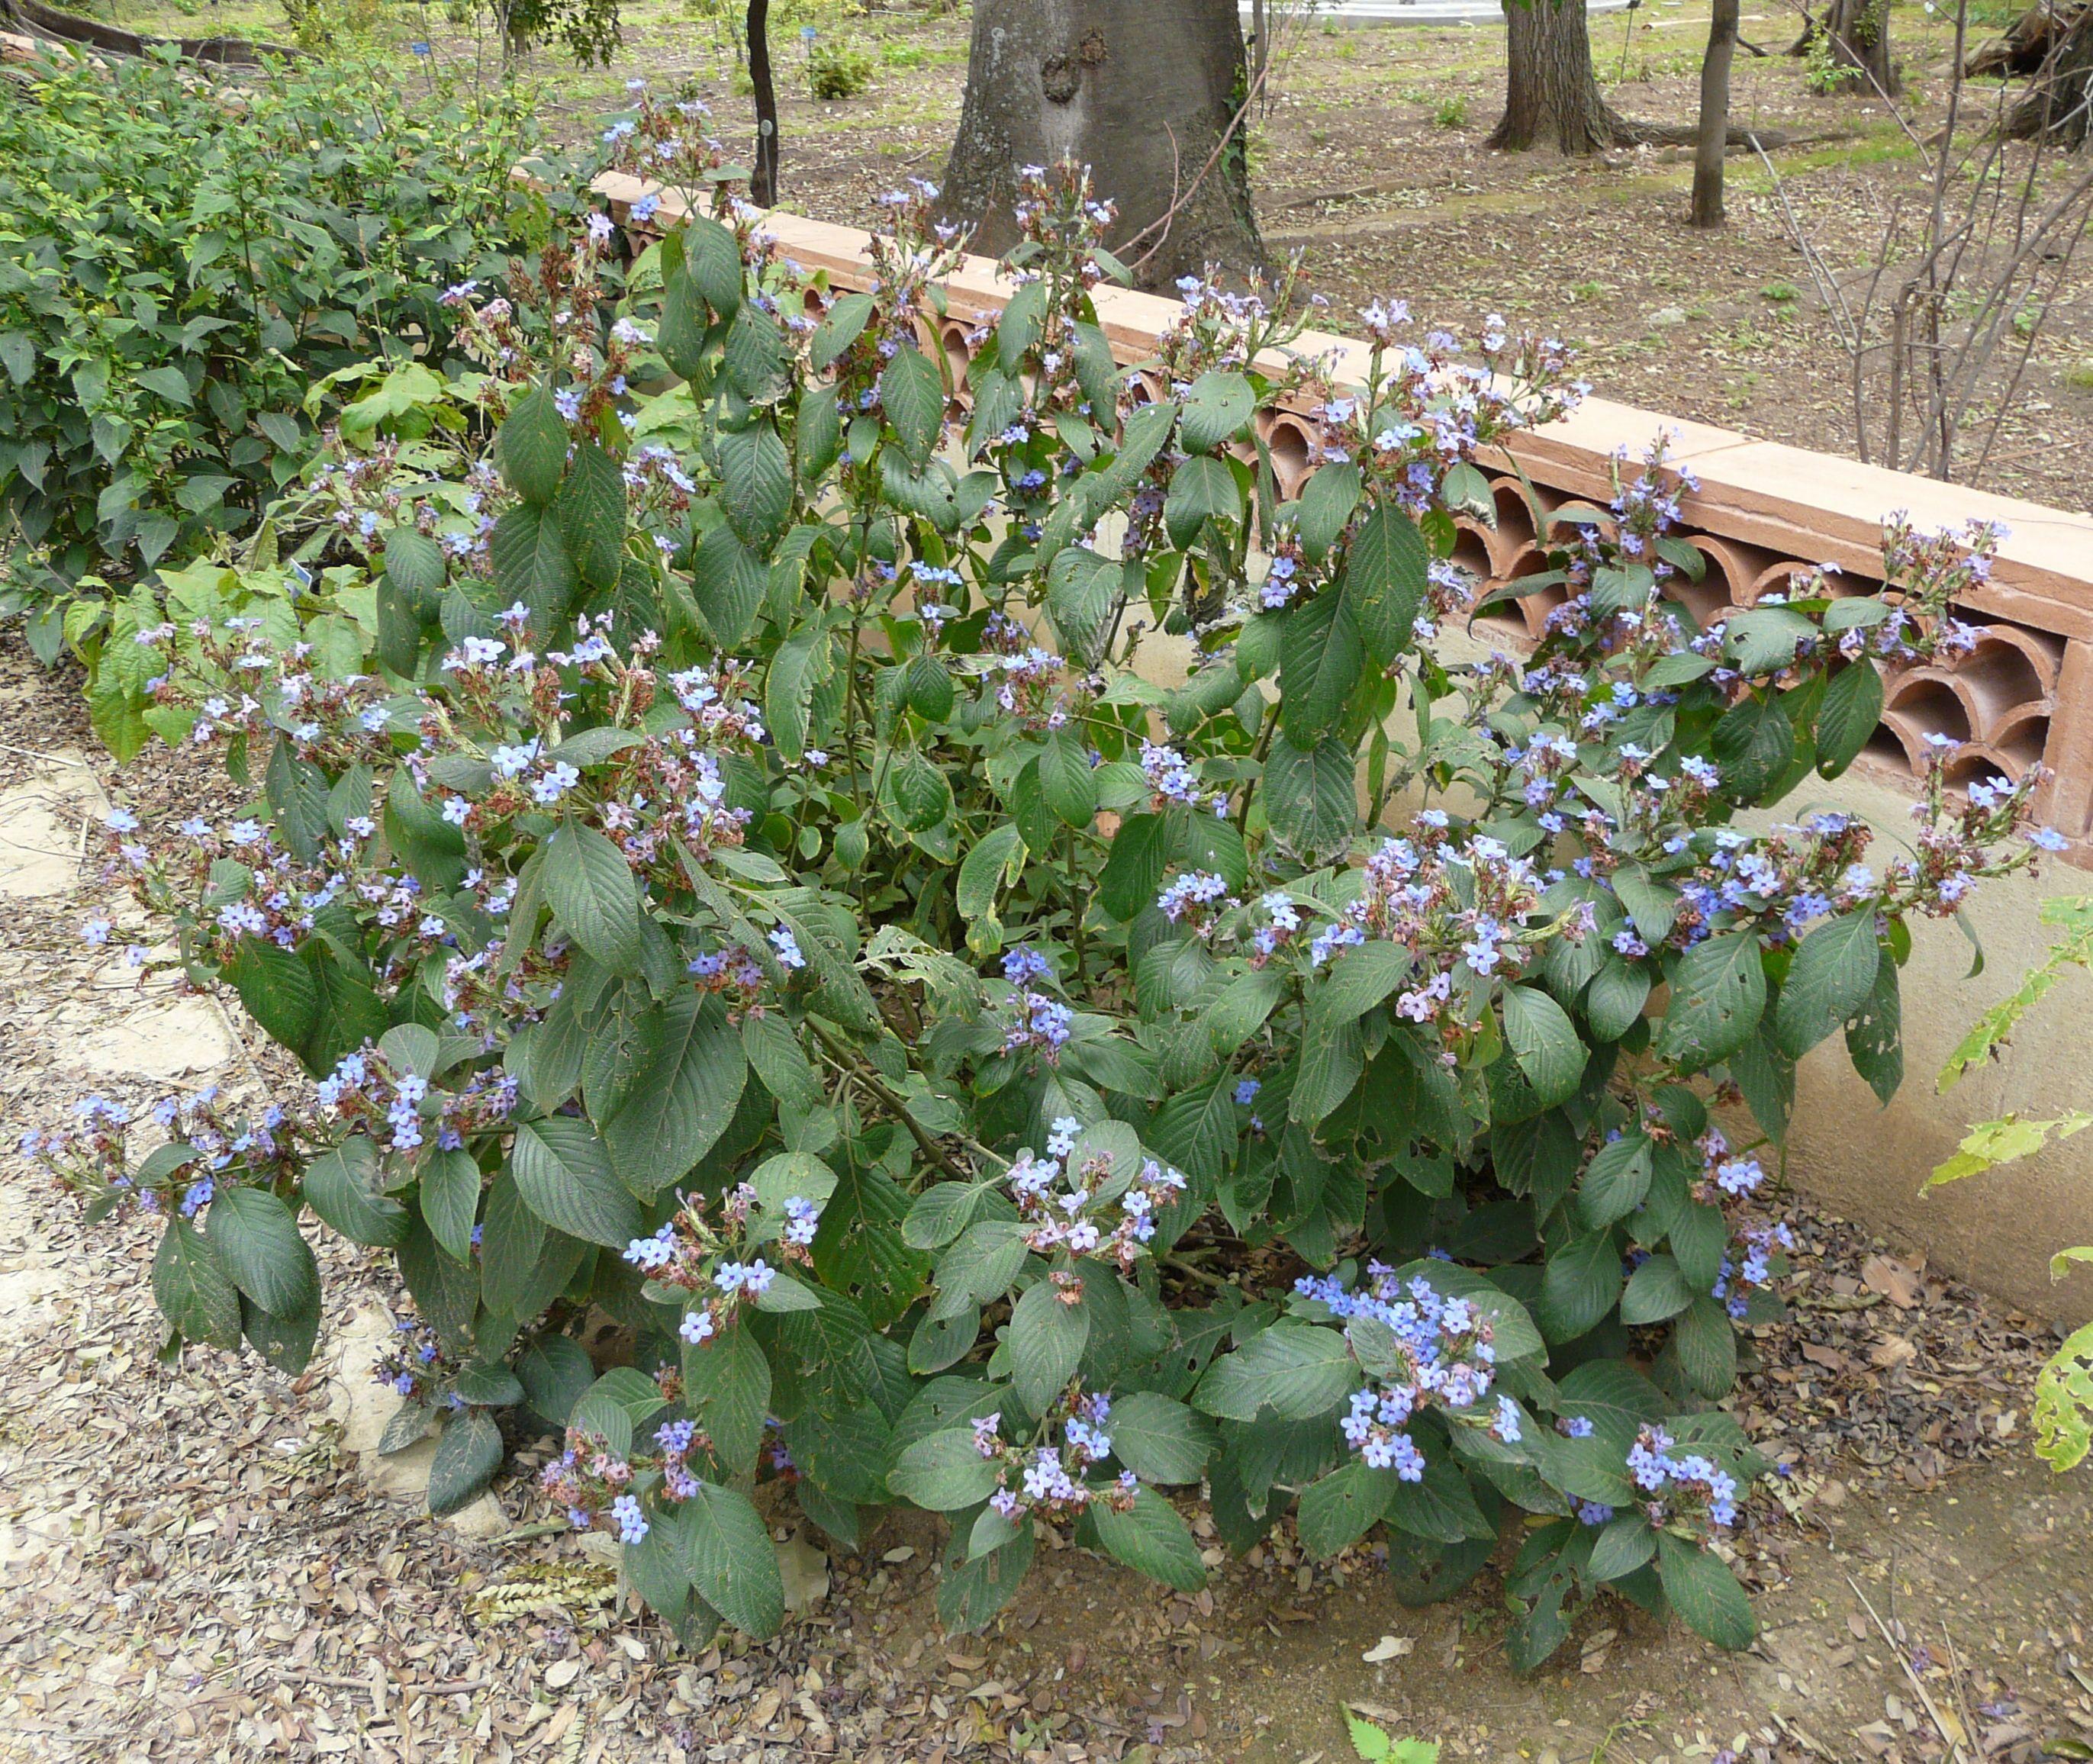 Flowers that like sun and moist soil - Eranthemum Pulchellum Blue Sage Sun Ls Moist Soil Blooms Most Year In Ctrl Florida Zone